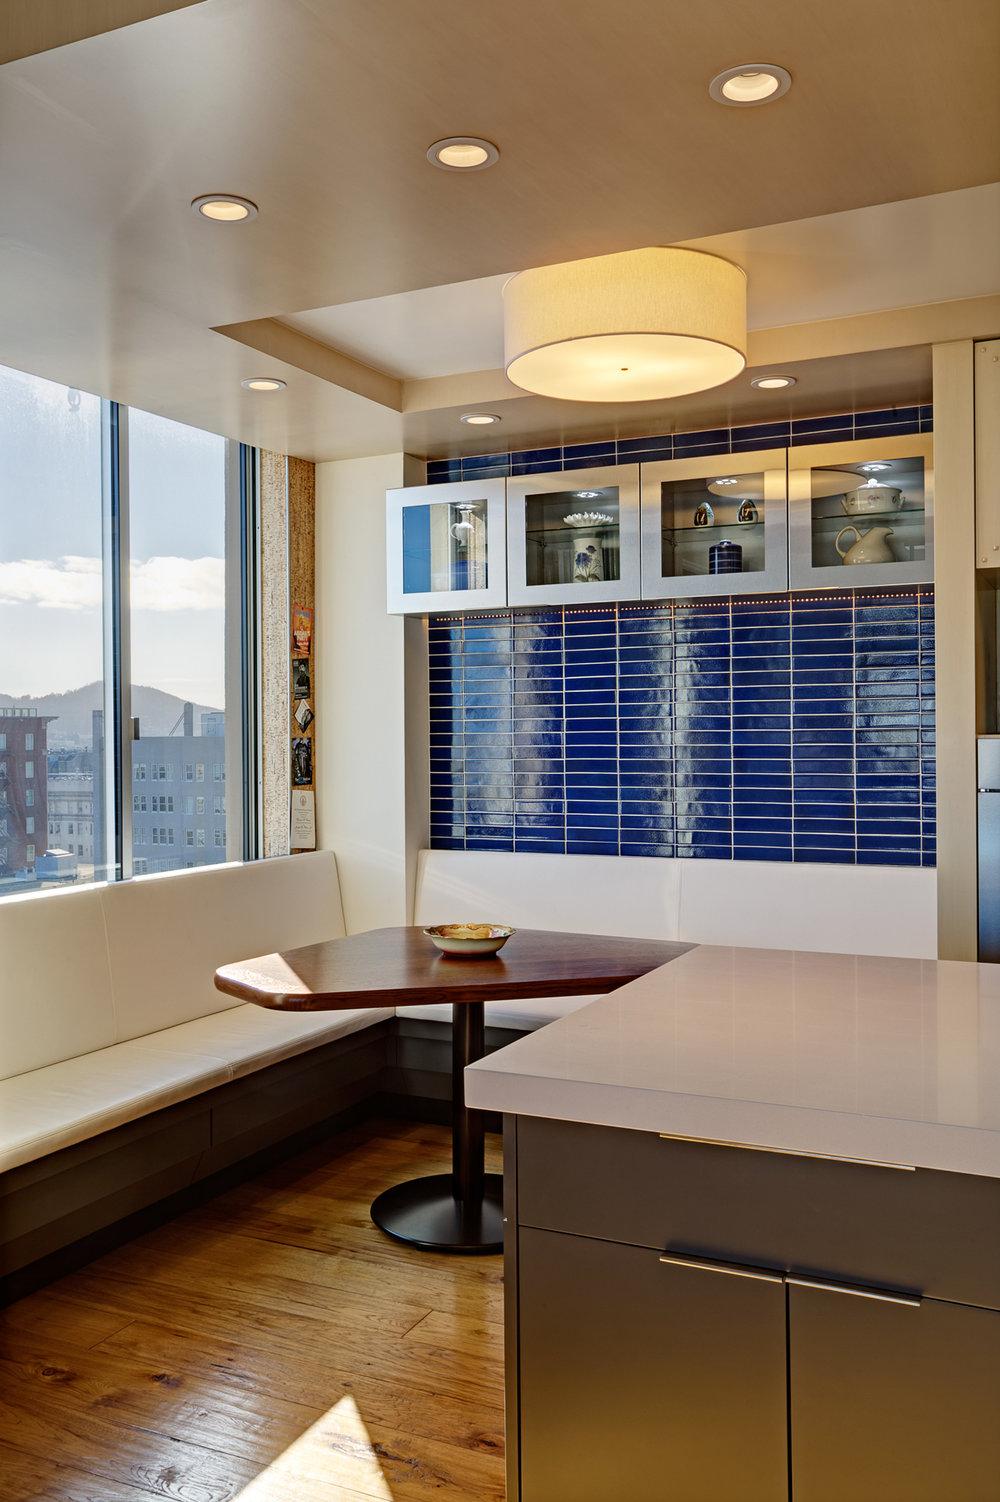 Kaplan-Architects-high-rise-interior-remodeled-kitchen-breakfast-area.jpg